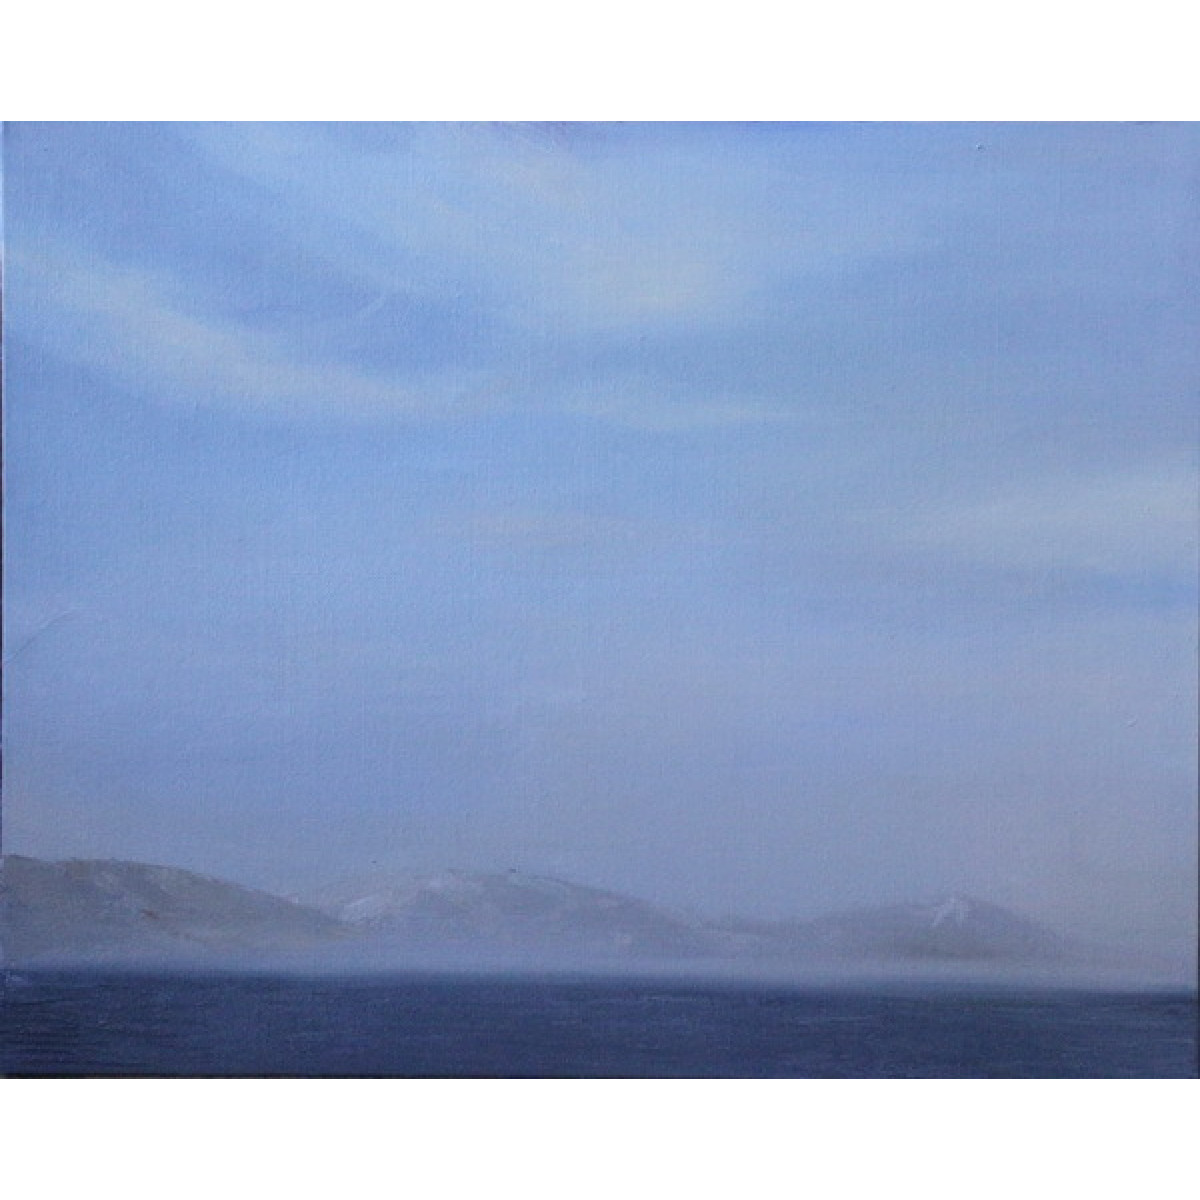 "Картина ""Солнечный день на озере"", холст на картоне, масло, 40х50см"